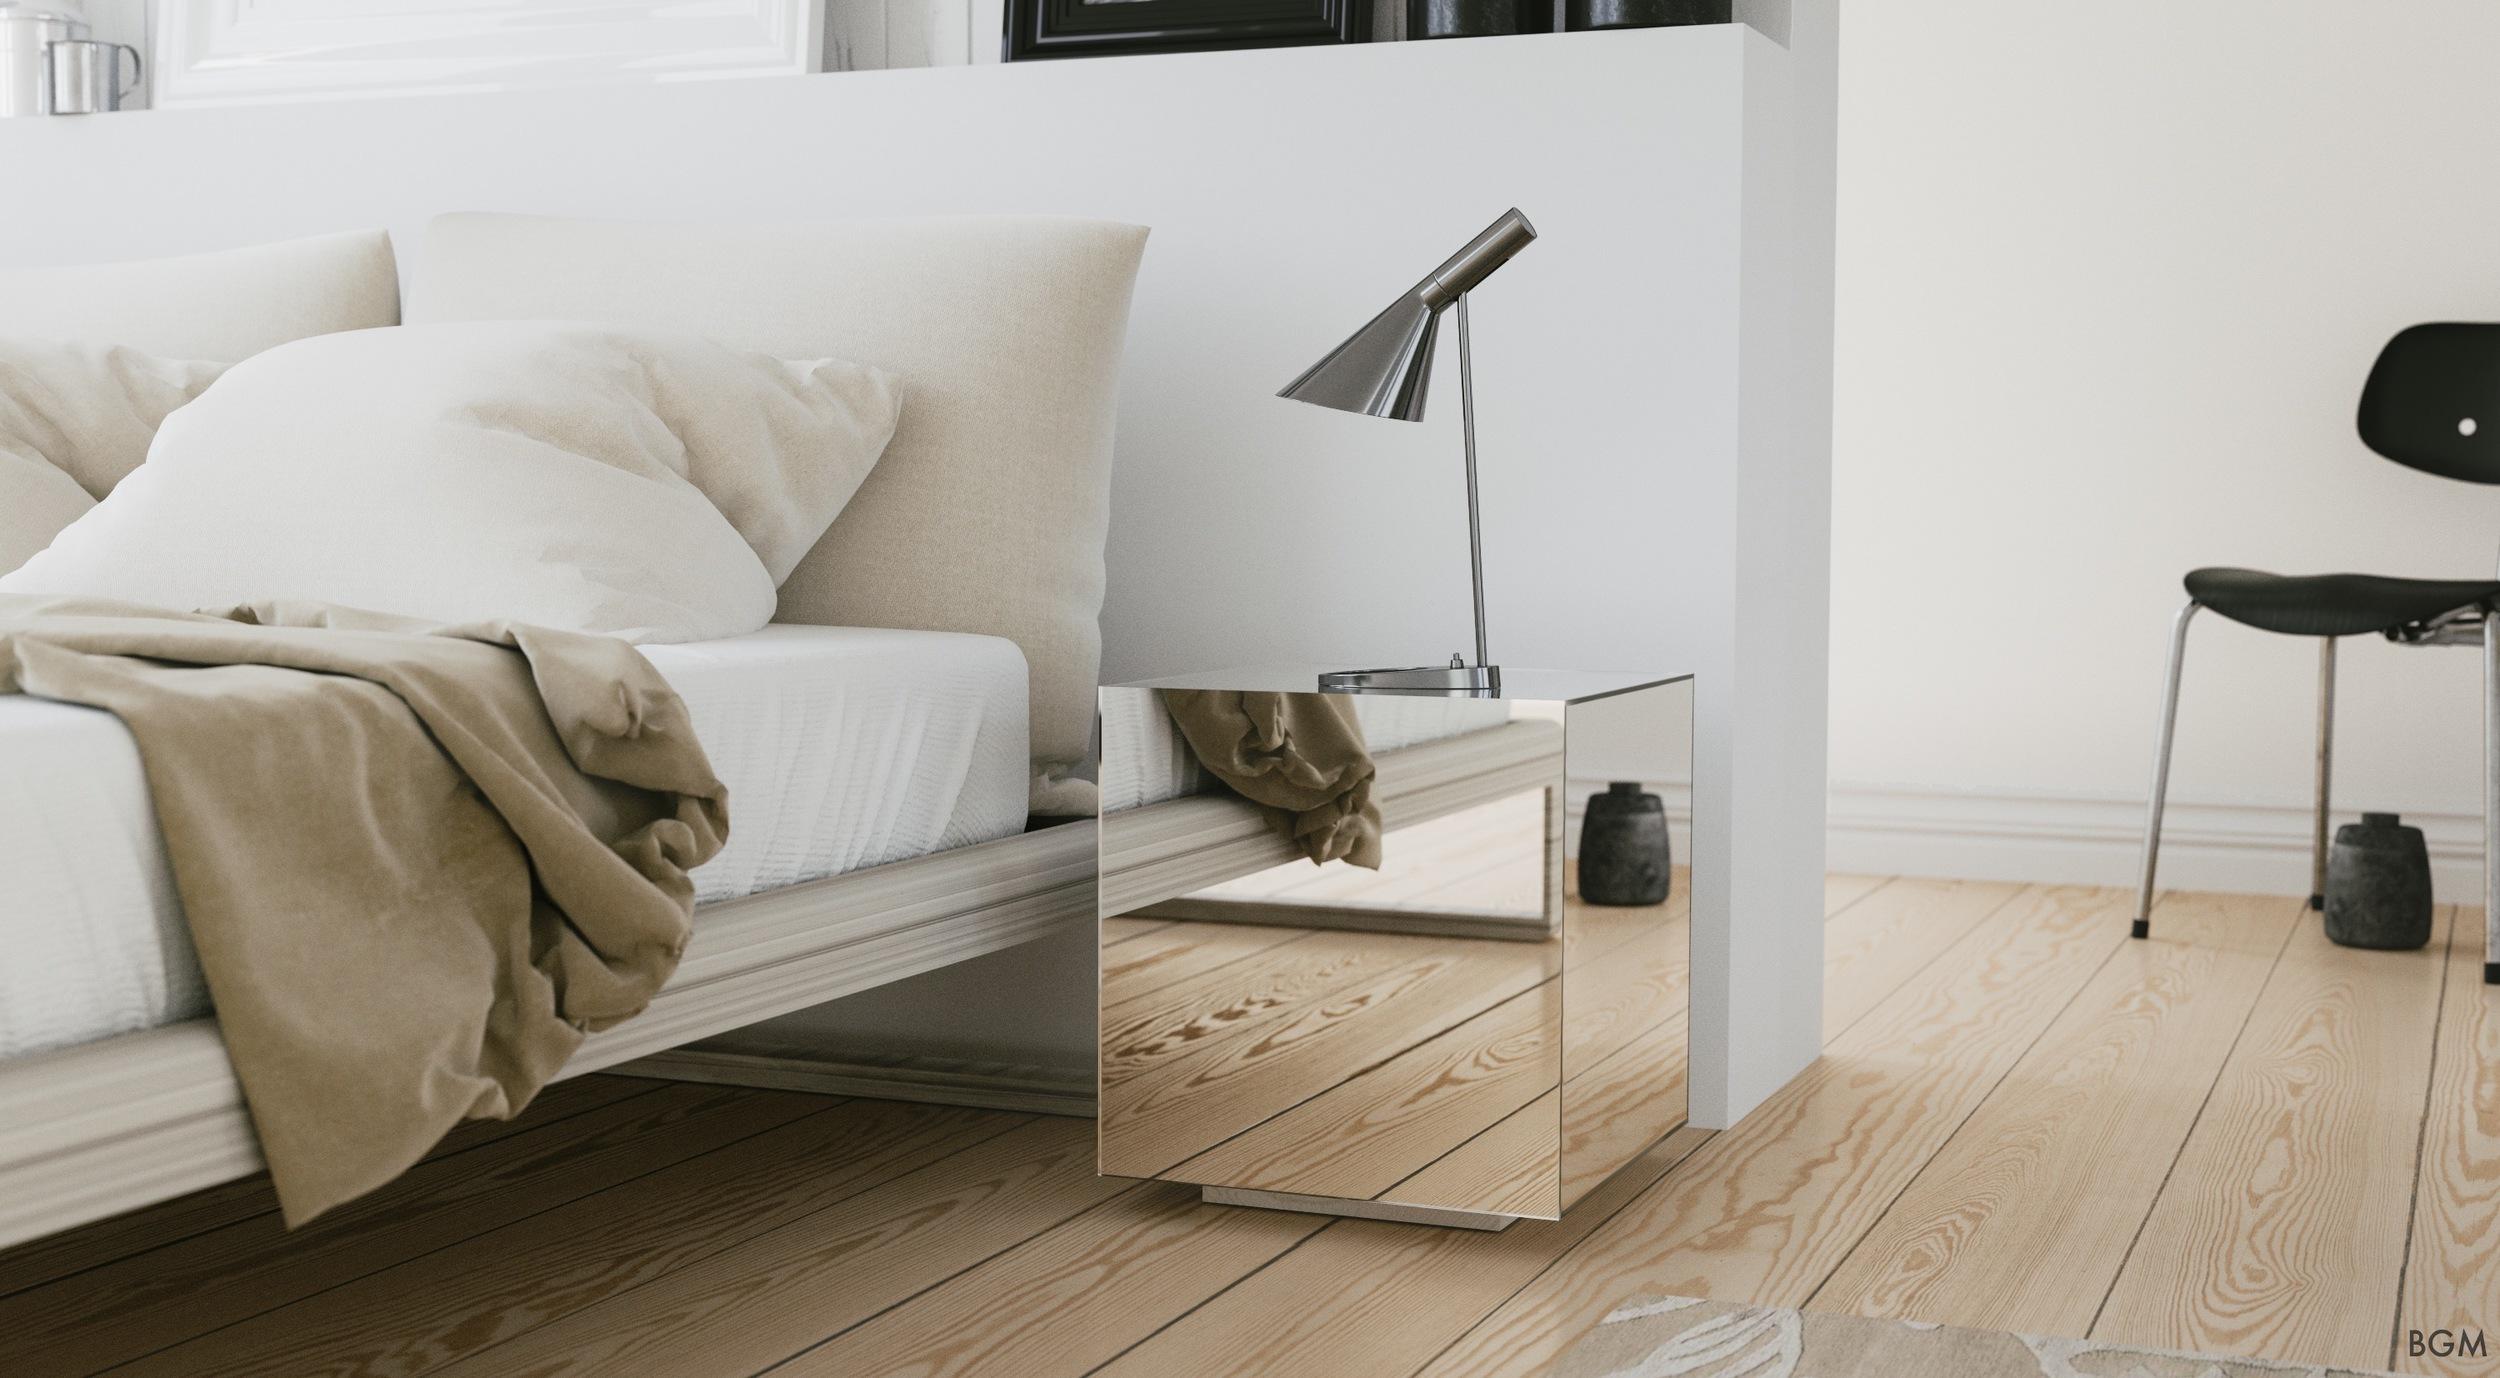 Mirrored Box by Birmingham Glass & Mirror